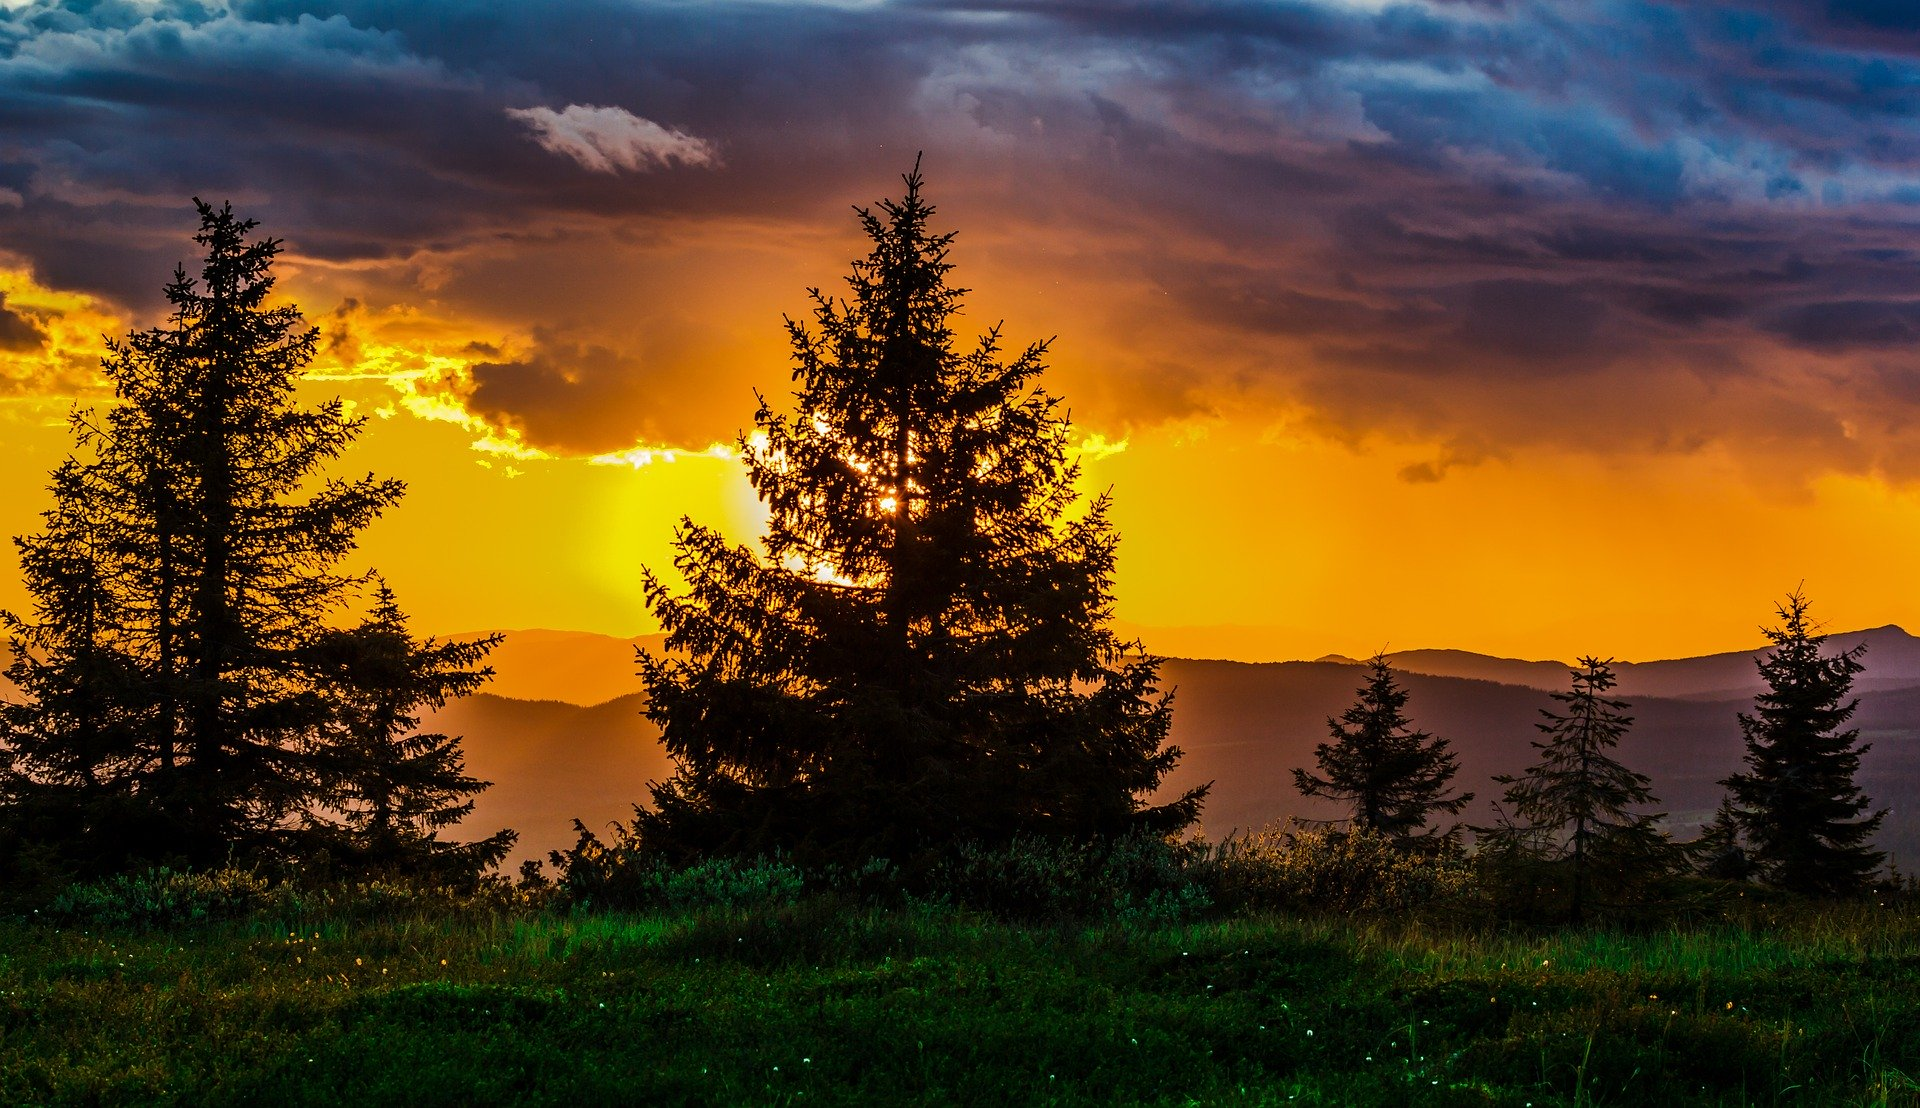 sunset-850873_1920